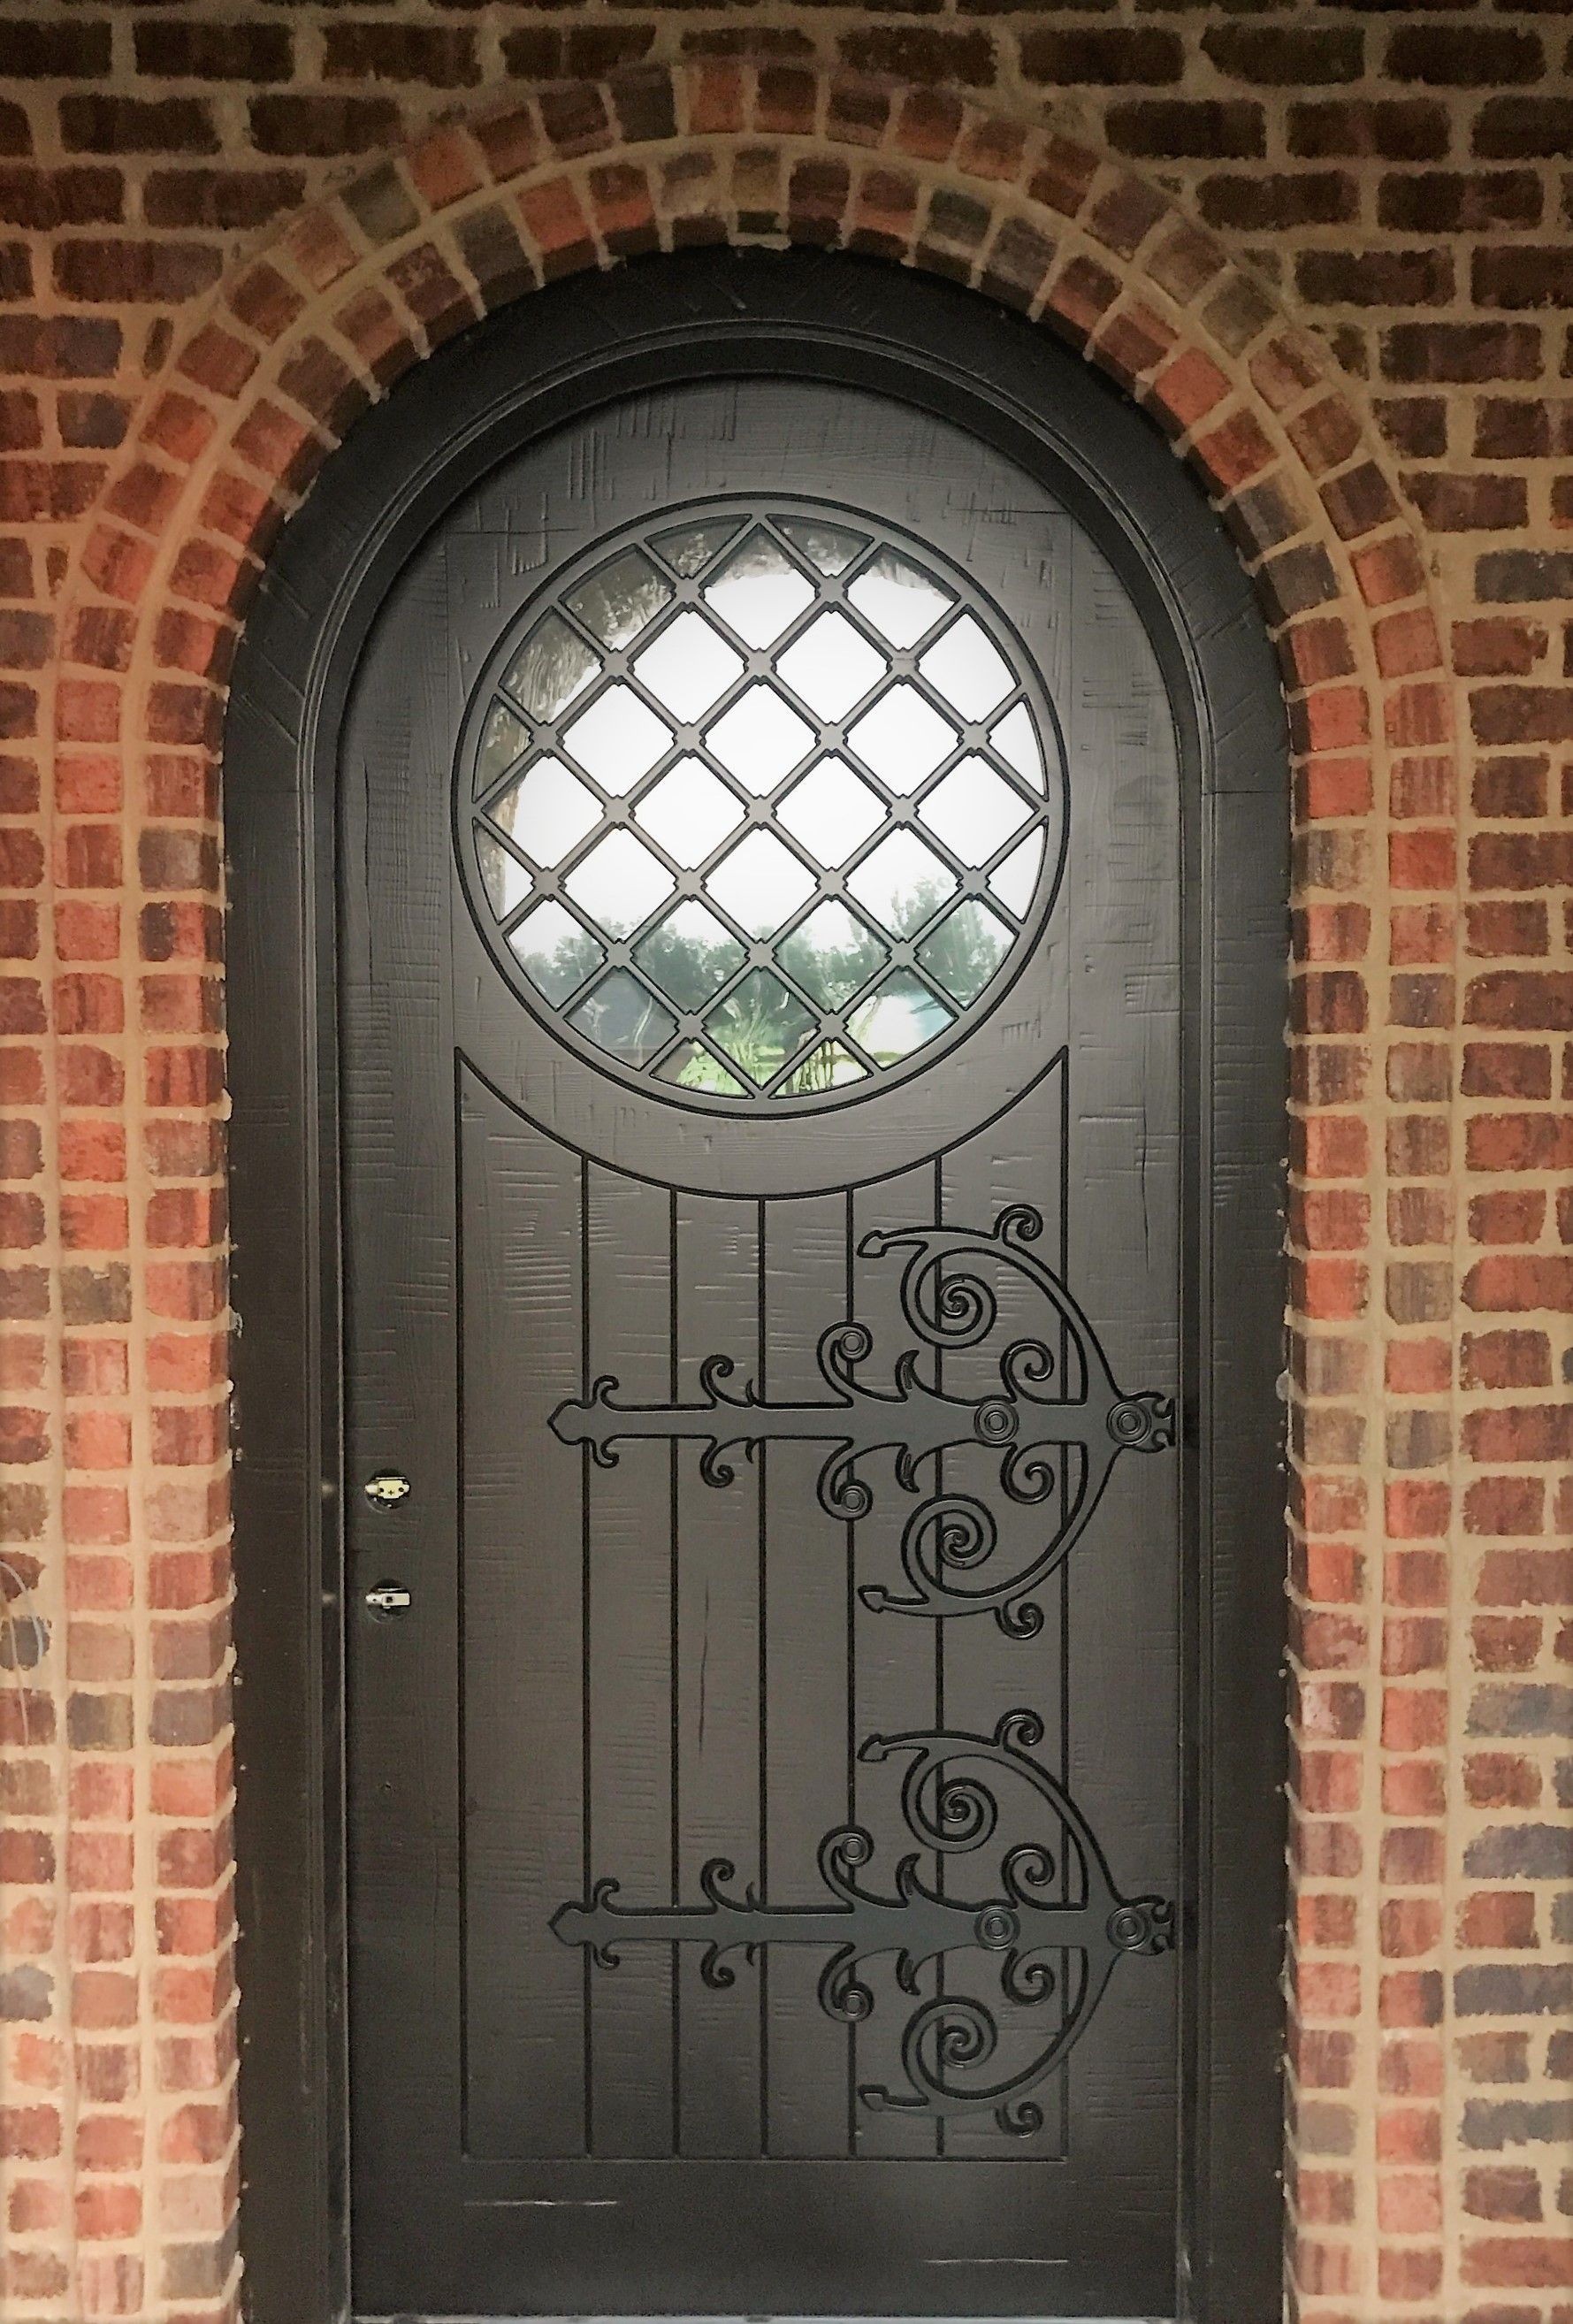 Custom Arched Door - Rustic Walnut Finish - Masterpiece Doors u0026 Shutters (844) 202 & Custom Arched Door - Rustic Walnut Finish - Masterpiece Doors ...